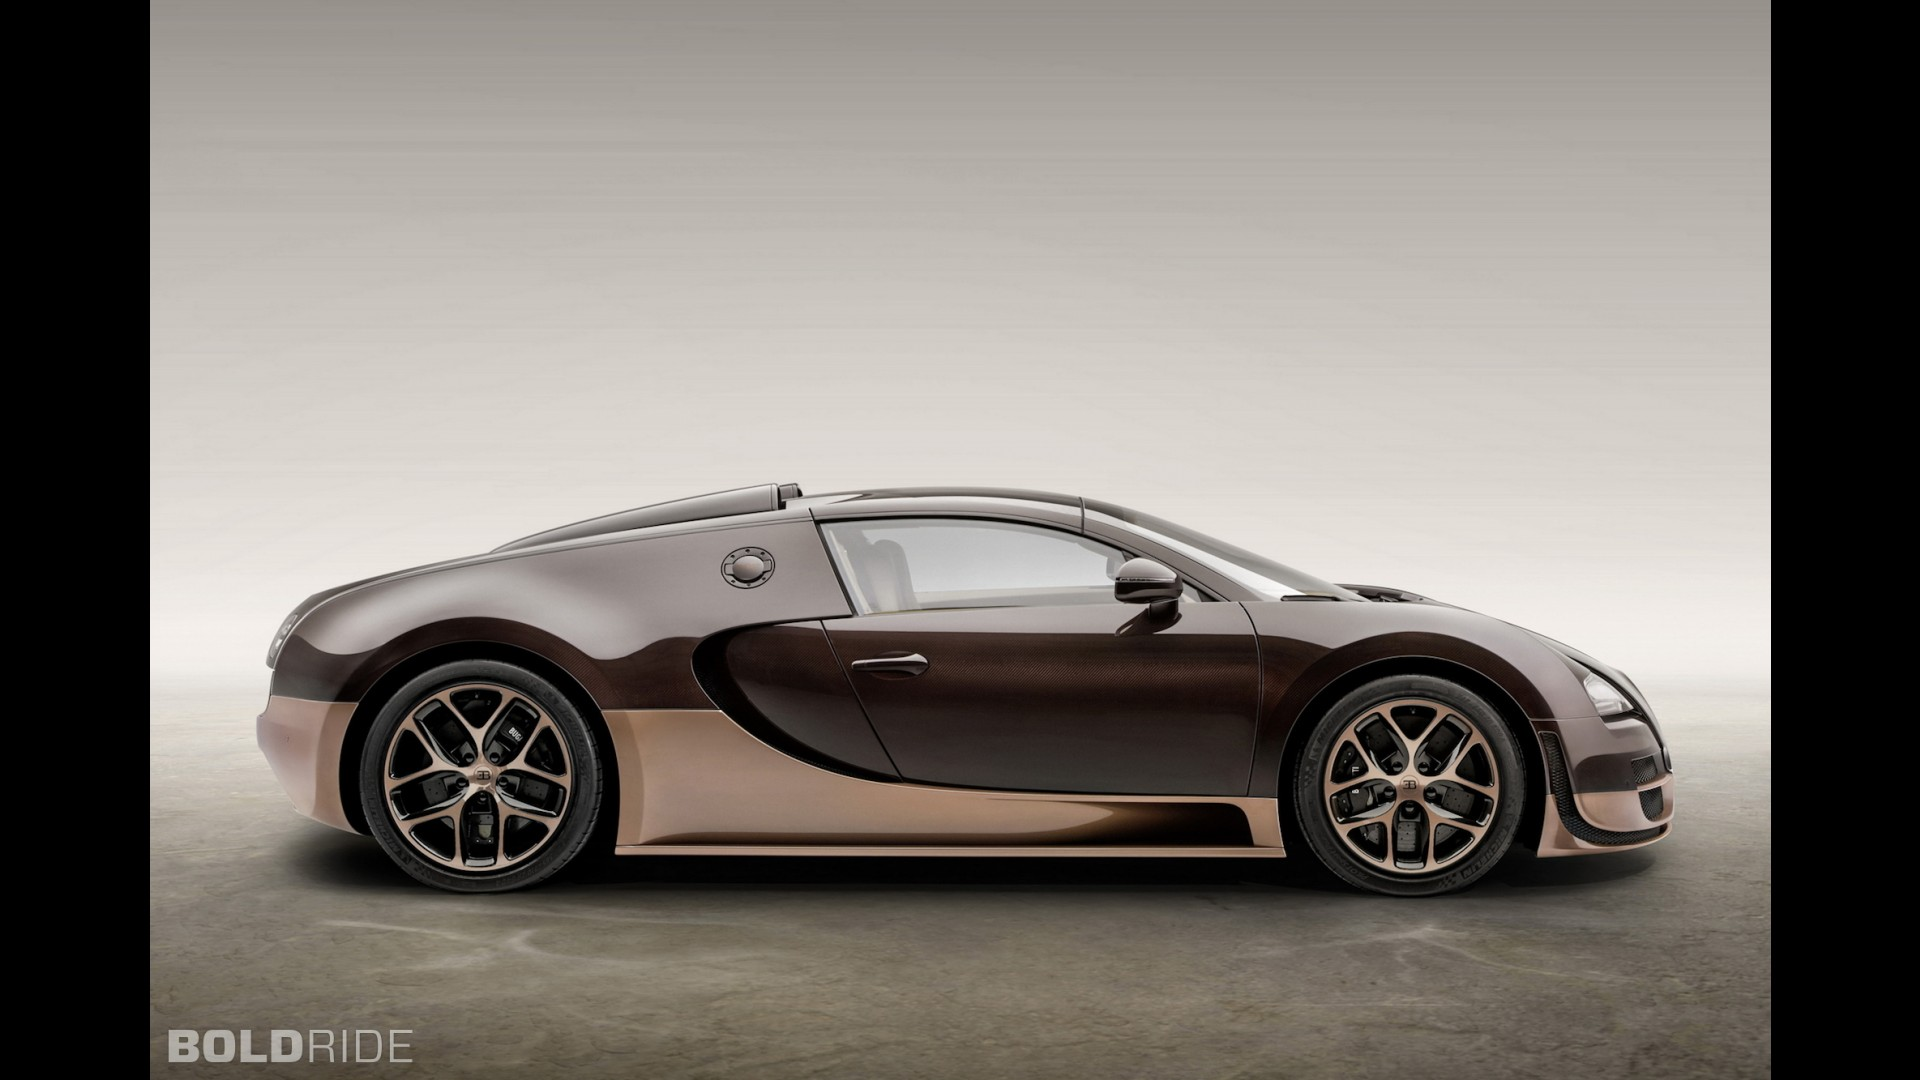 bugatti-veyron-grand-sport-roadster-vitesse-rembrandt Astounding Bugatti Veyron Grand Sport Vitesse Hd Cars Trend